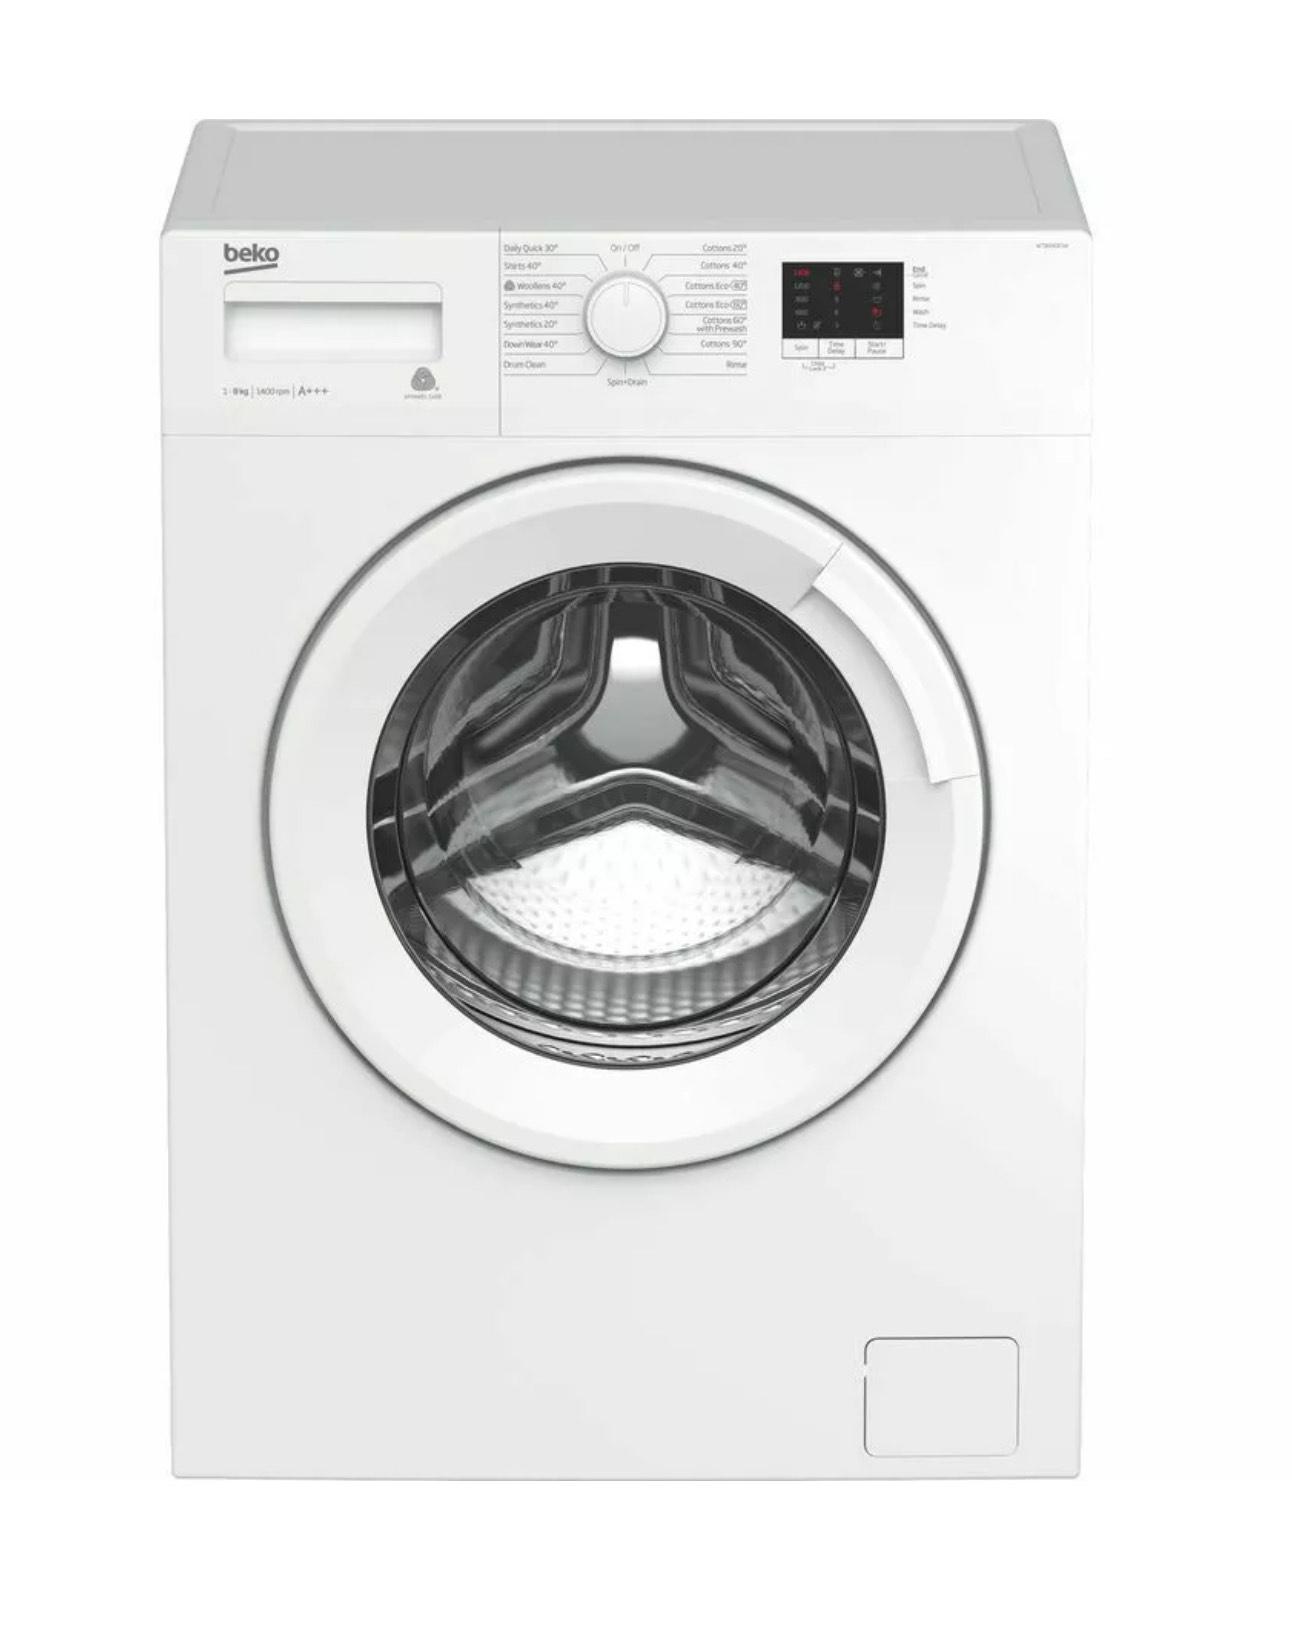 BEKO WTB840E1W 8 kg 1400 Spin Washing Machine – White £199 @ Currys PC World